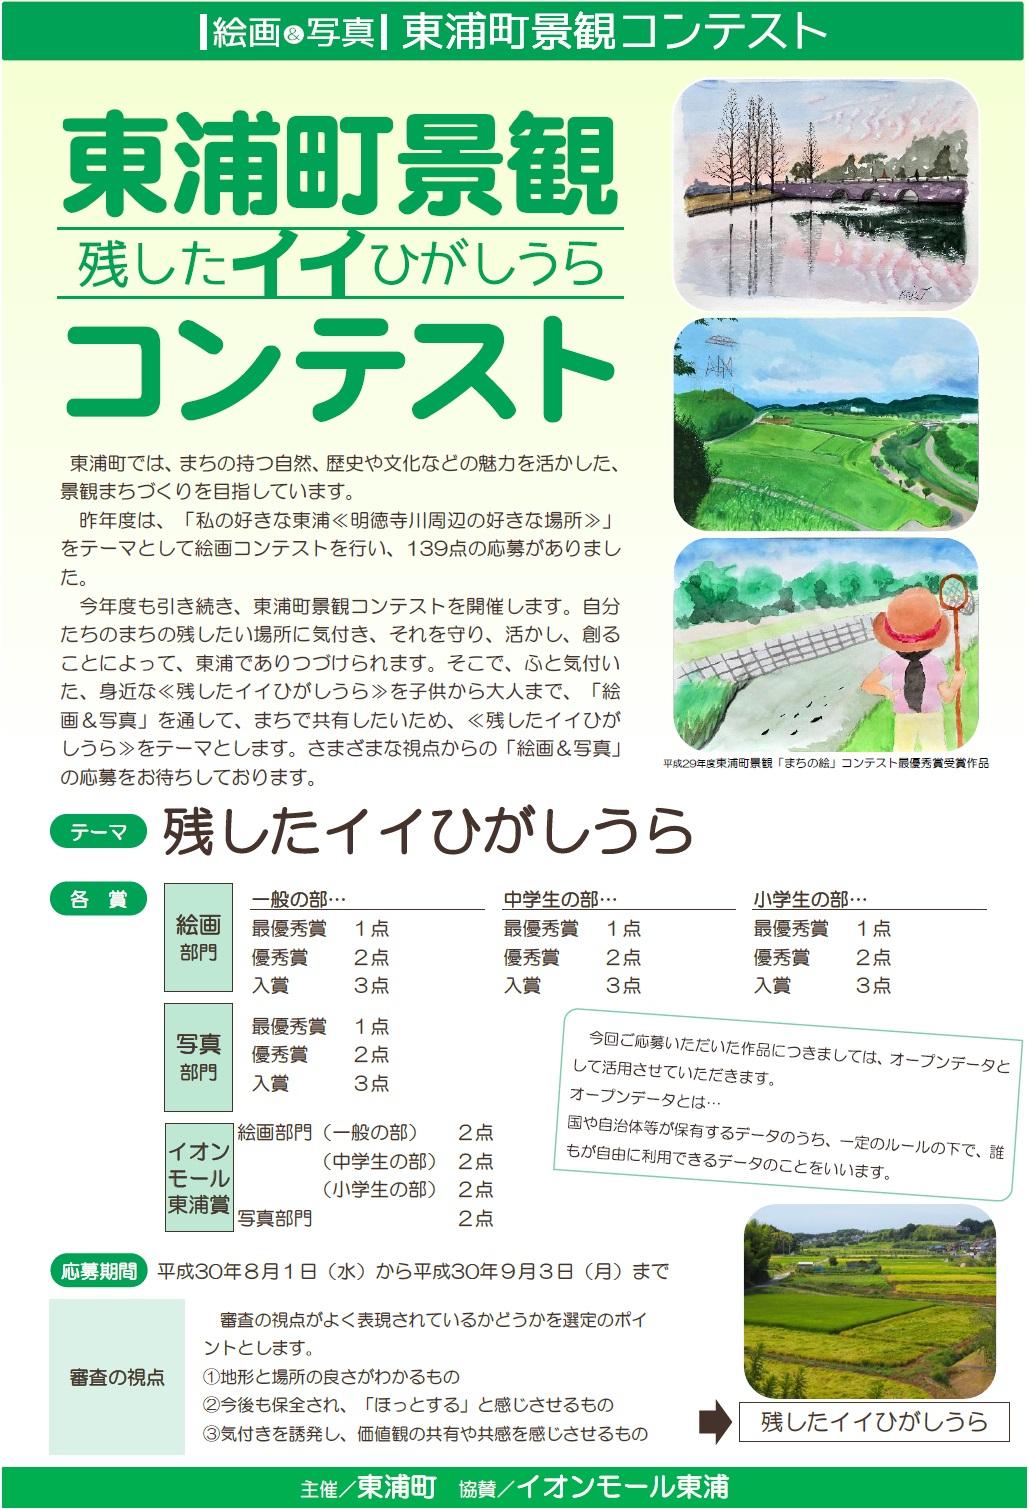 Keikan_contest20180801a